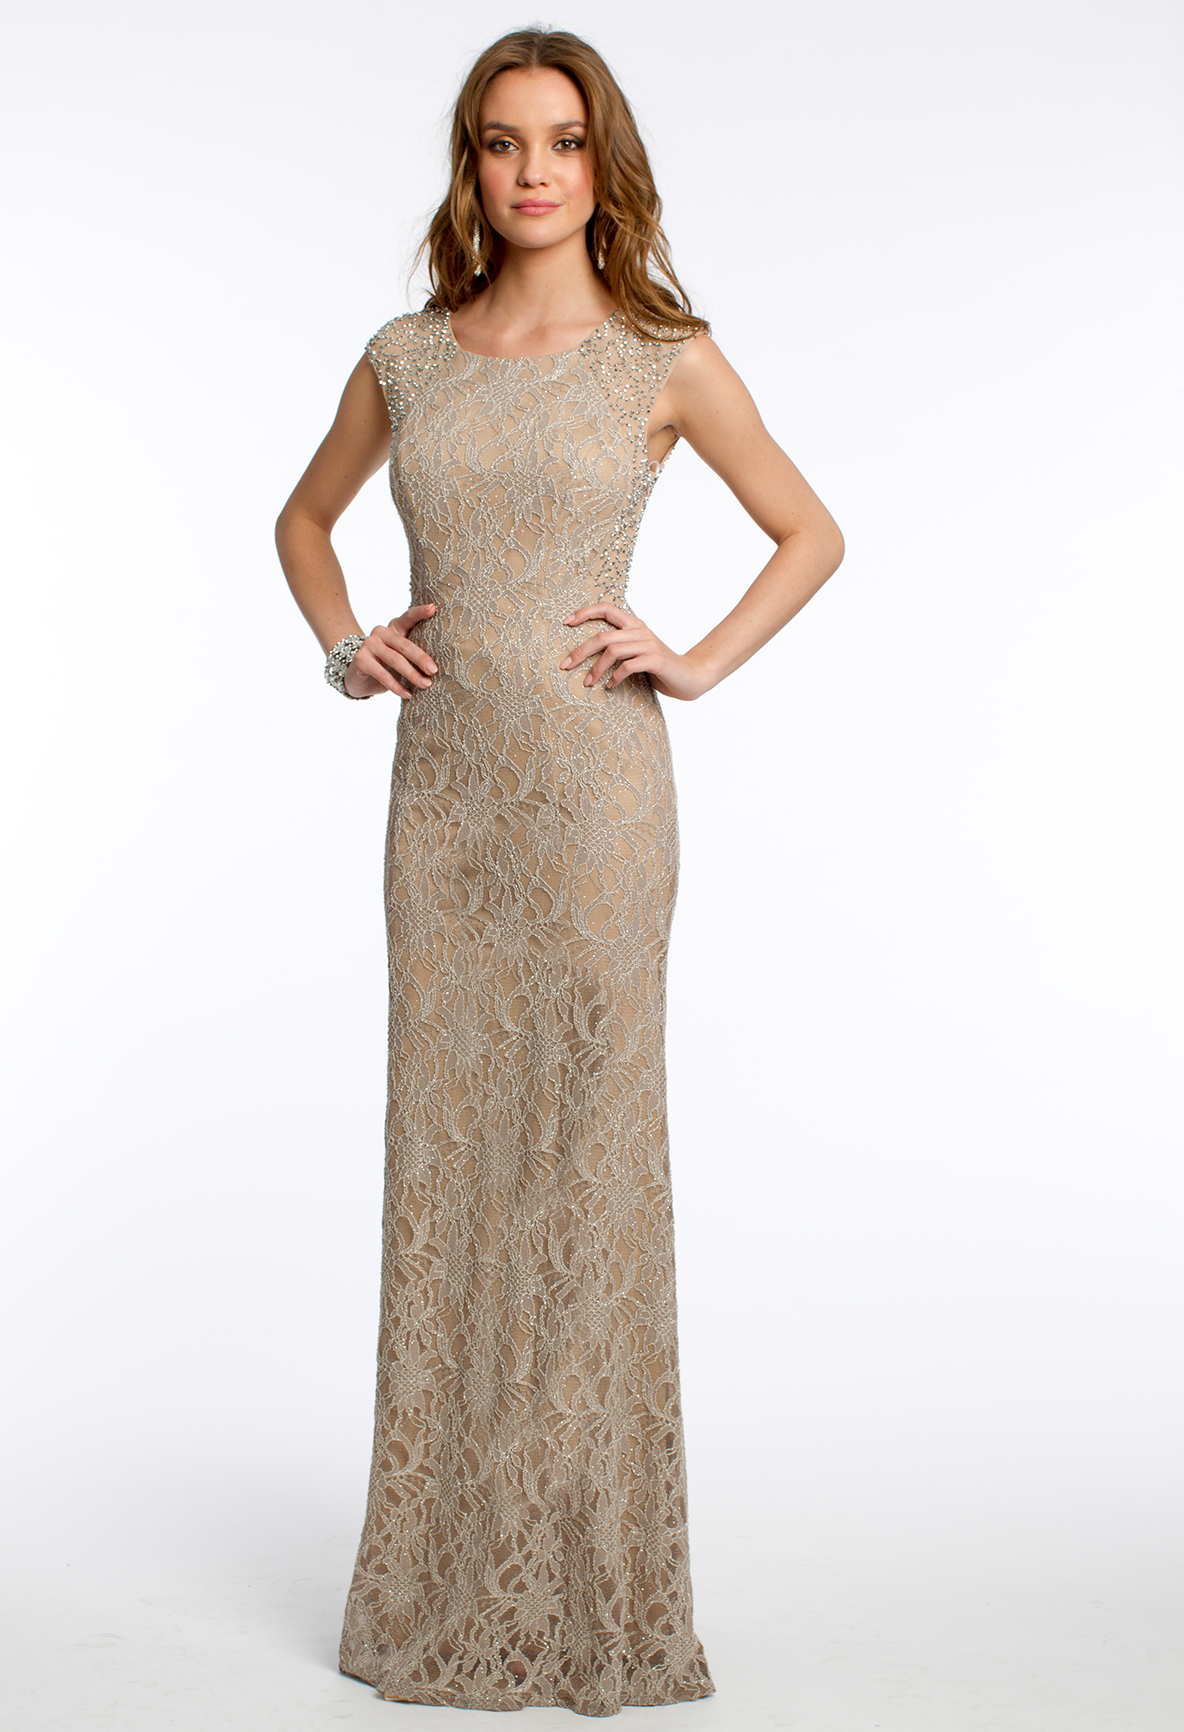 Glitter Lace Illusion Cap Sleeve Dress #camillelavie #CLVprom   PROM ...